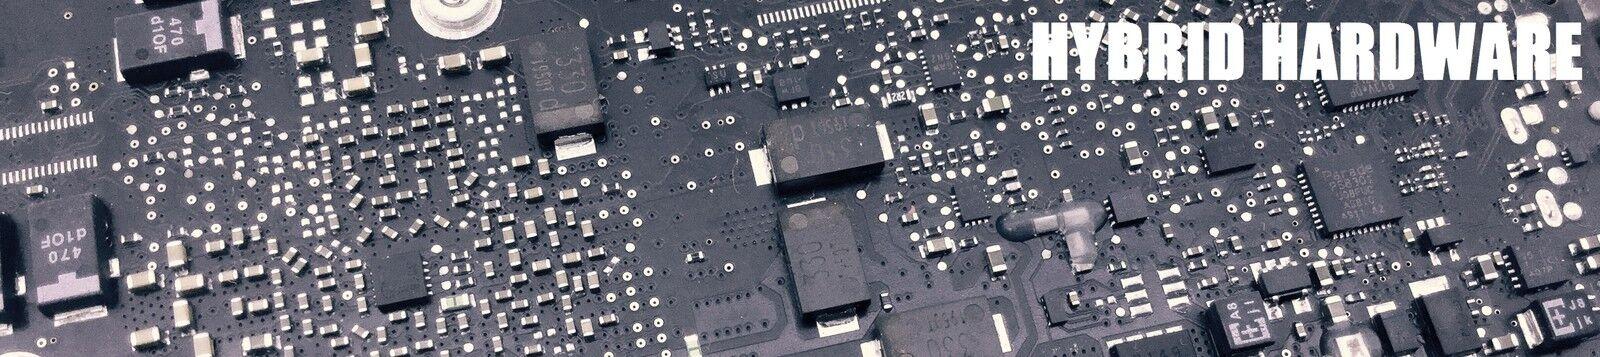 Hybrid Hardware